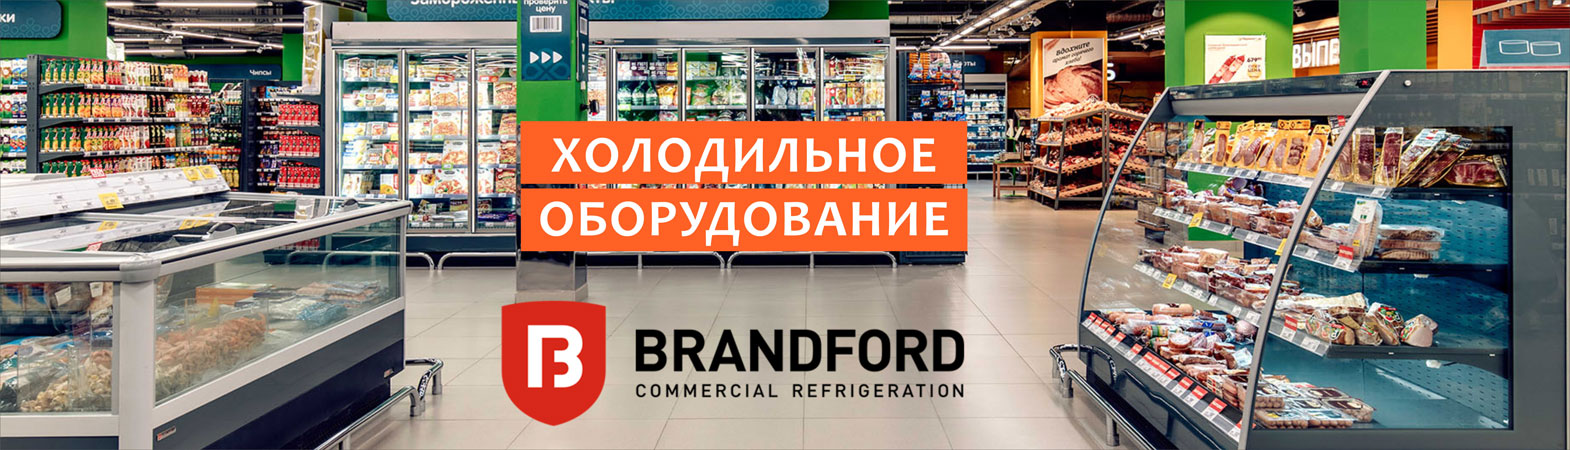 brandford